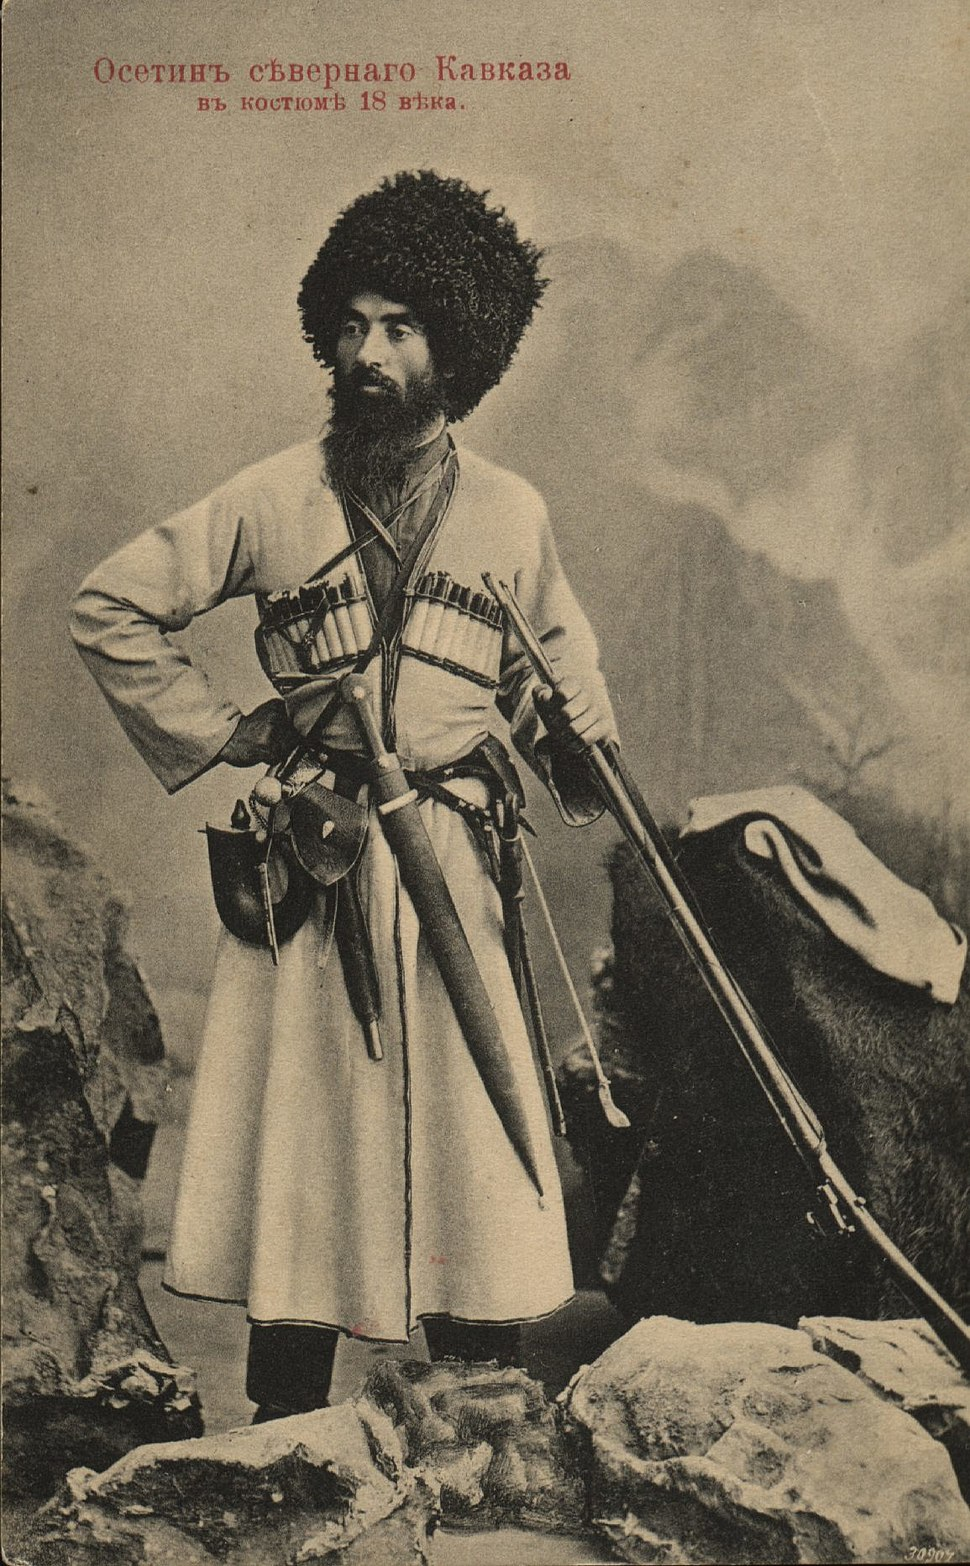 Ramonov vano ossetin northern caucasia dress 18 century